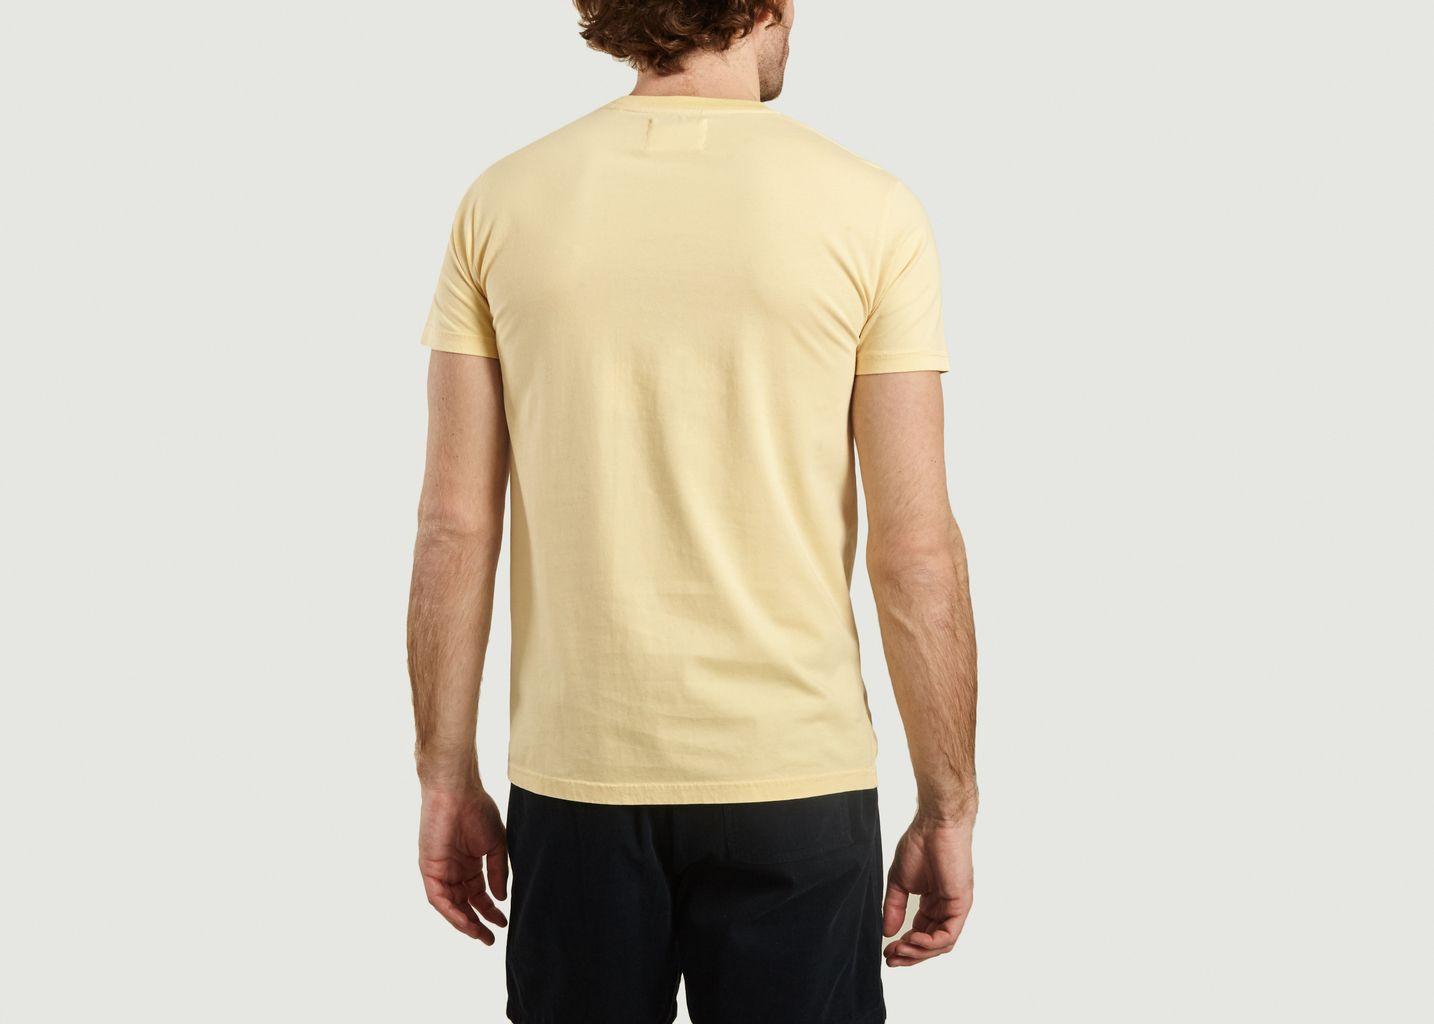 Tshirt Dantas - La Paz